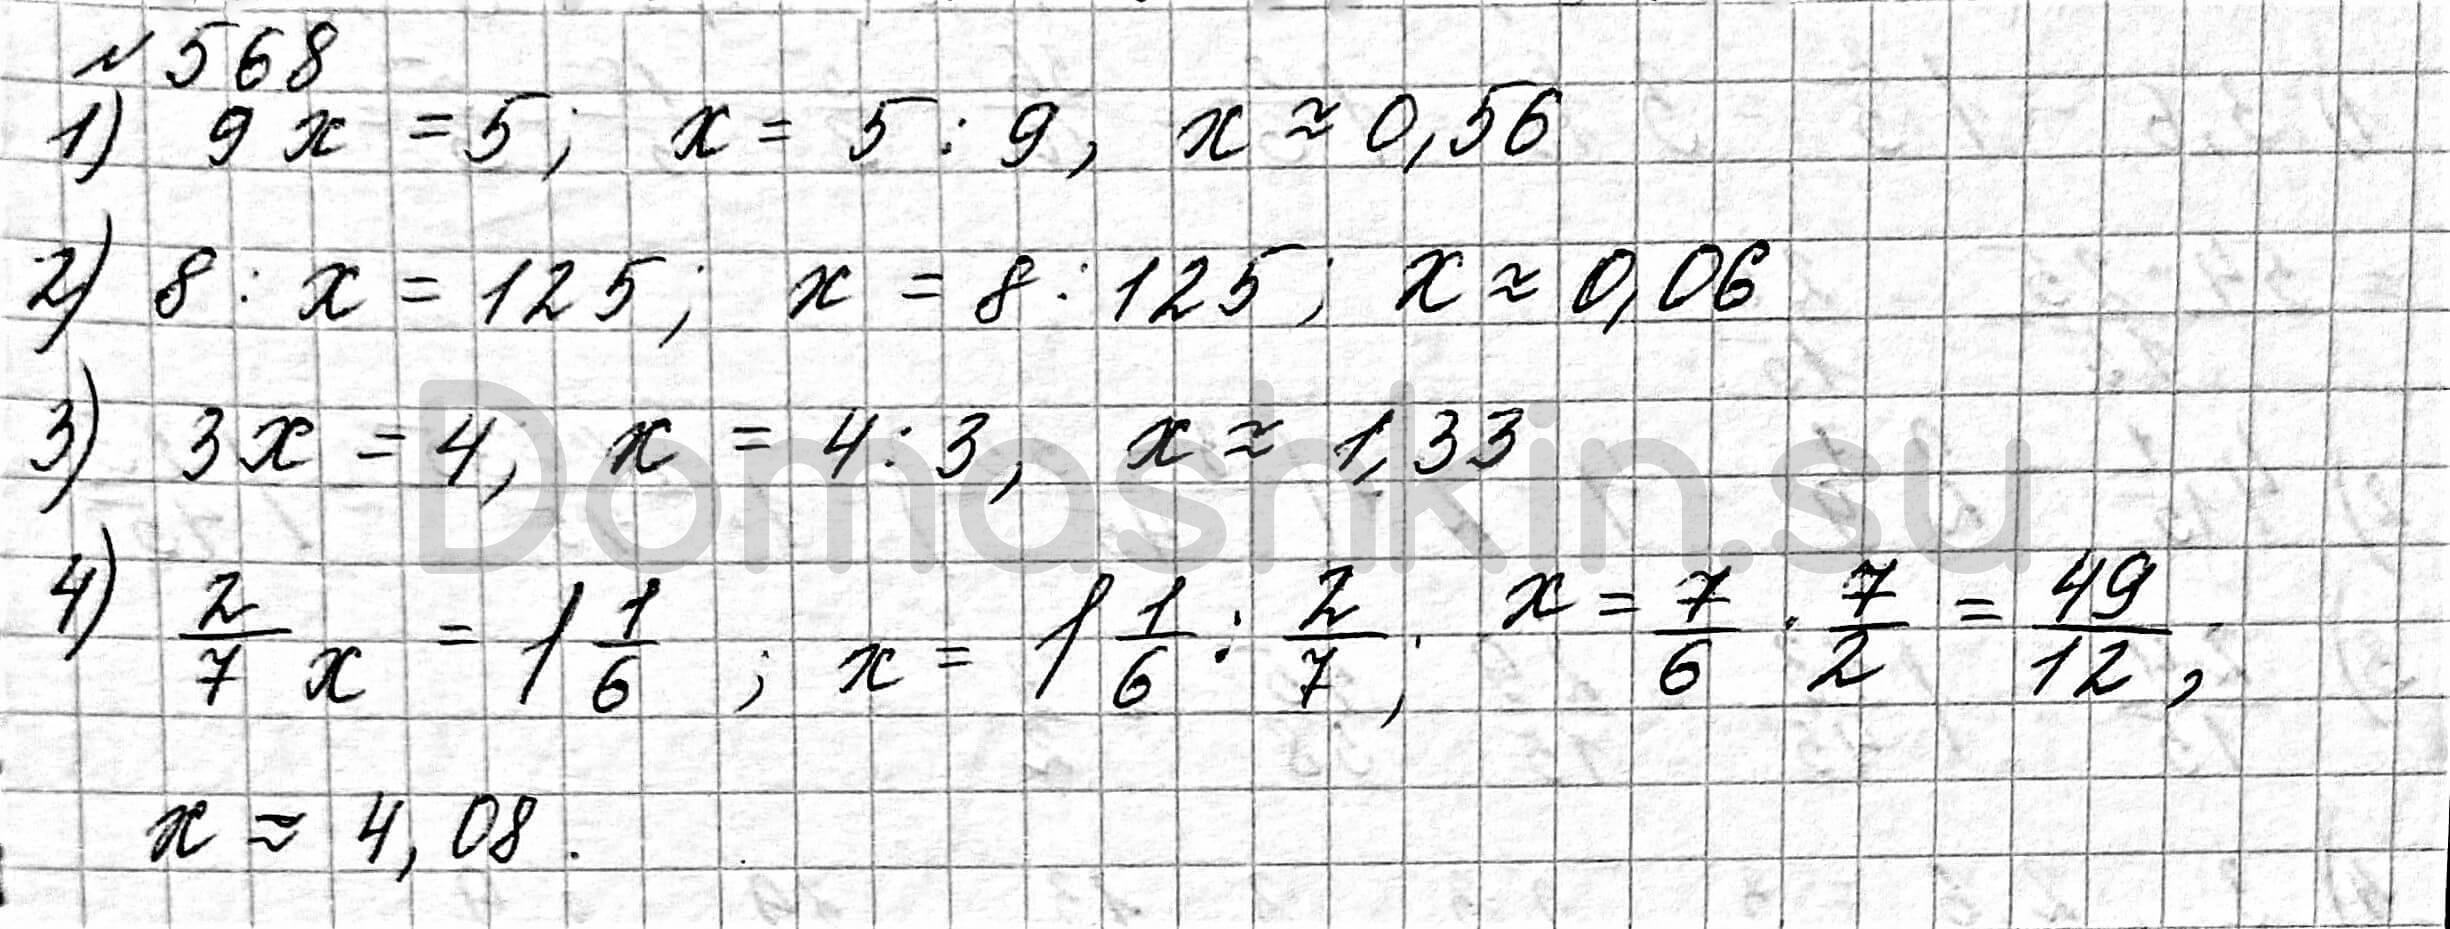 Математика 6 класс учебник Мерзляк номер 568 решение